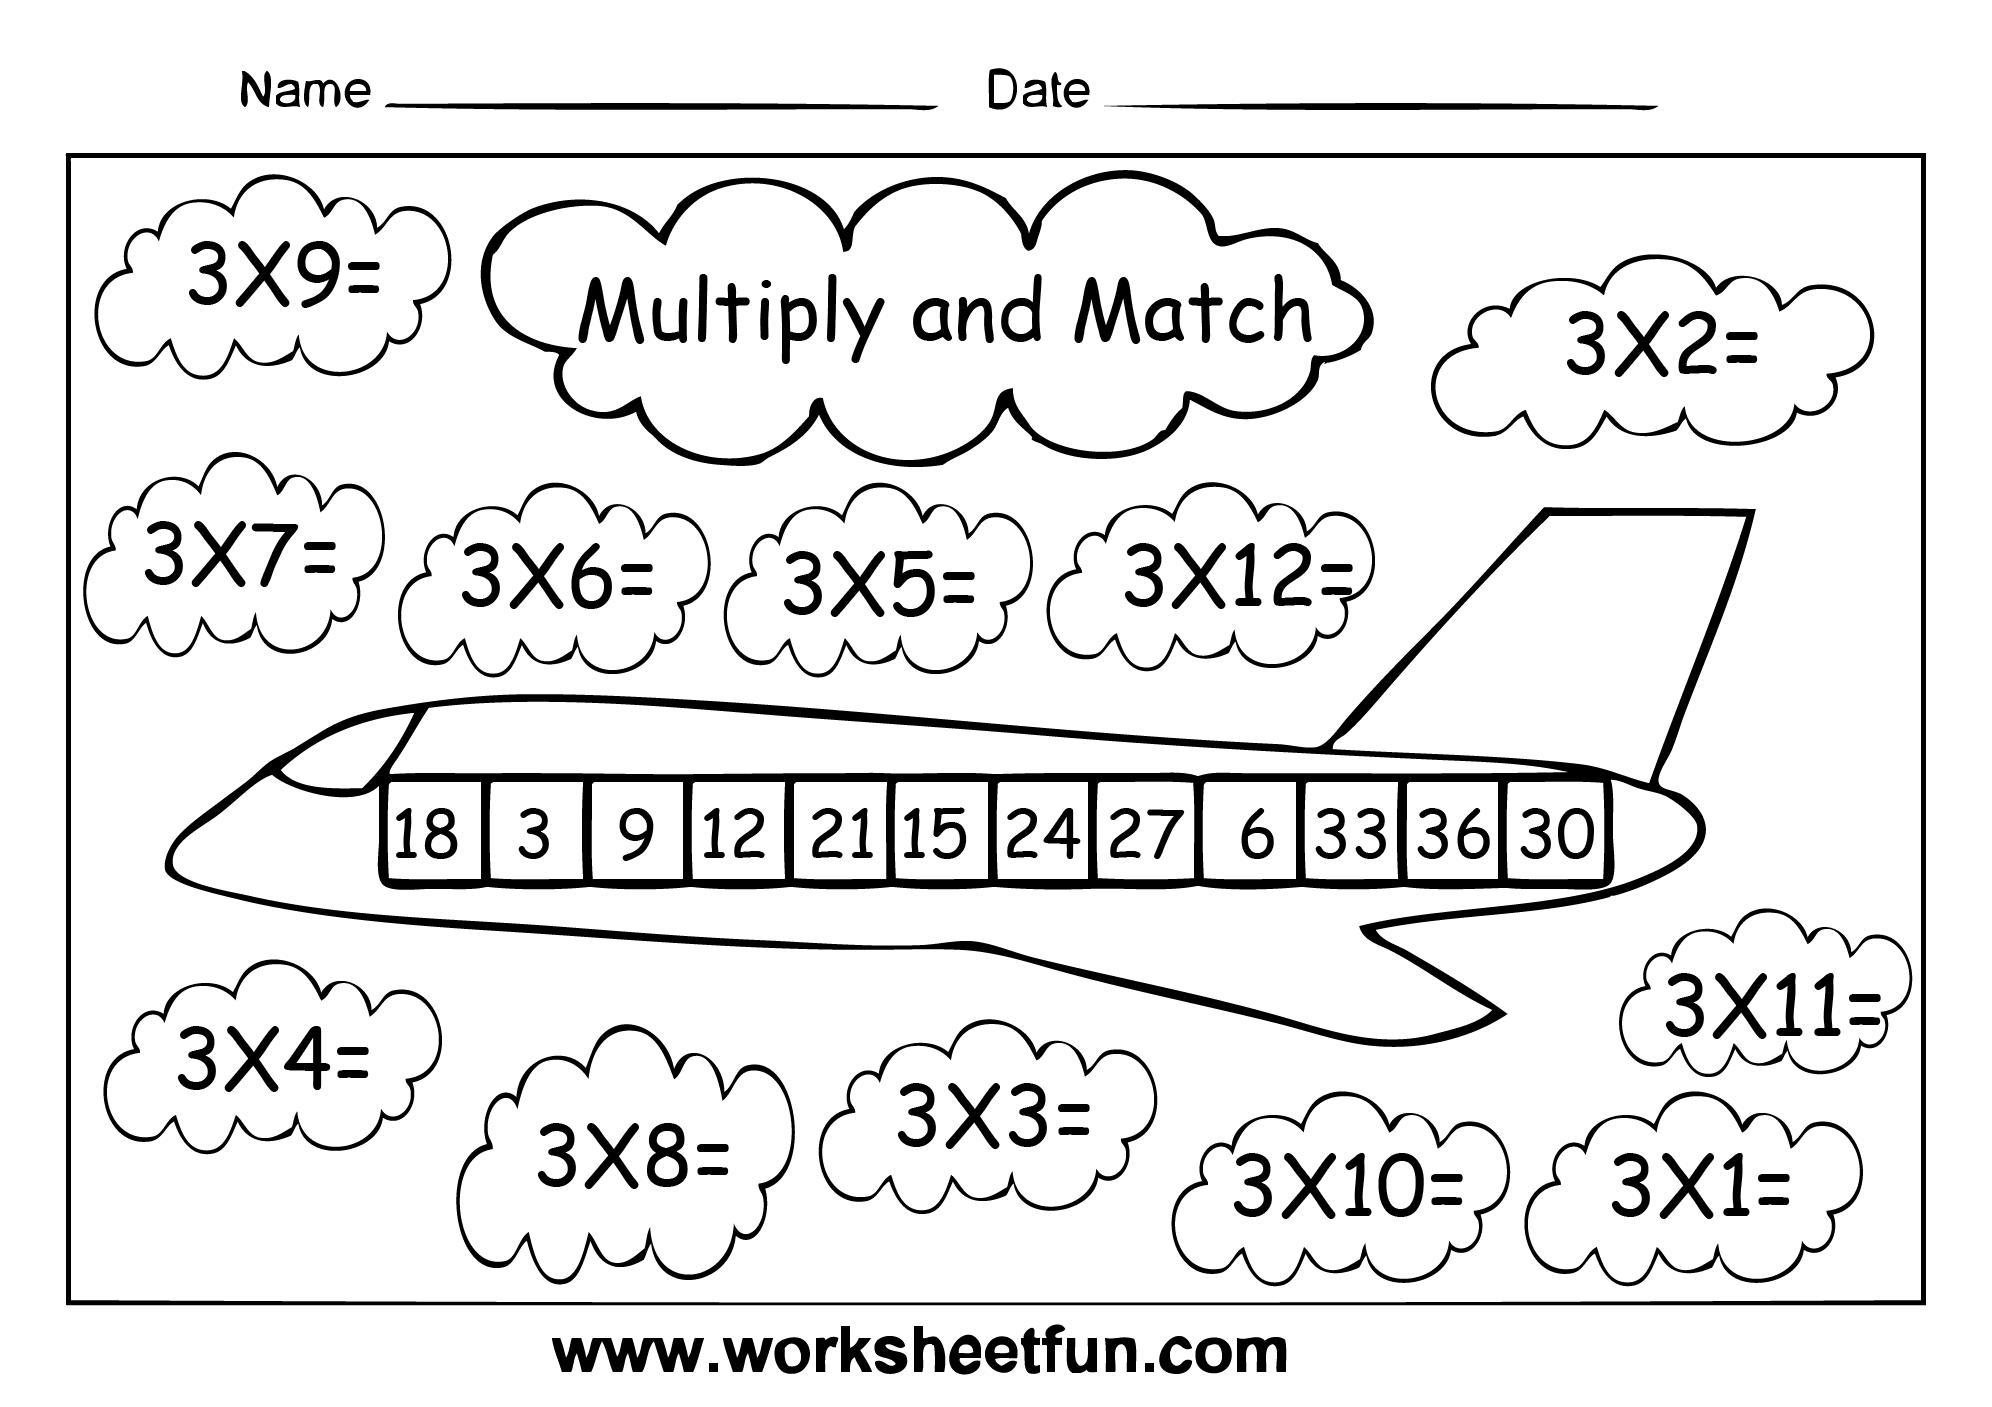 Multiplication Worksheets Factors Of 3